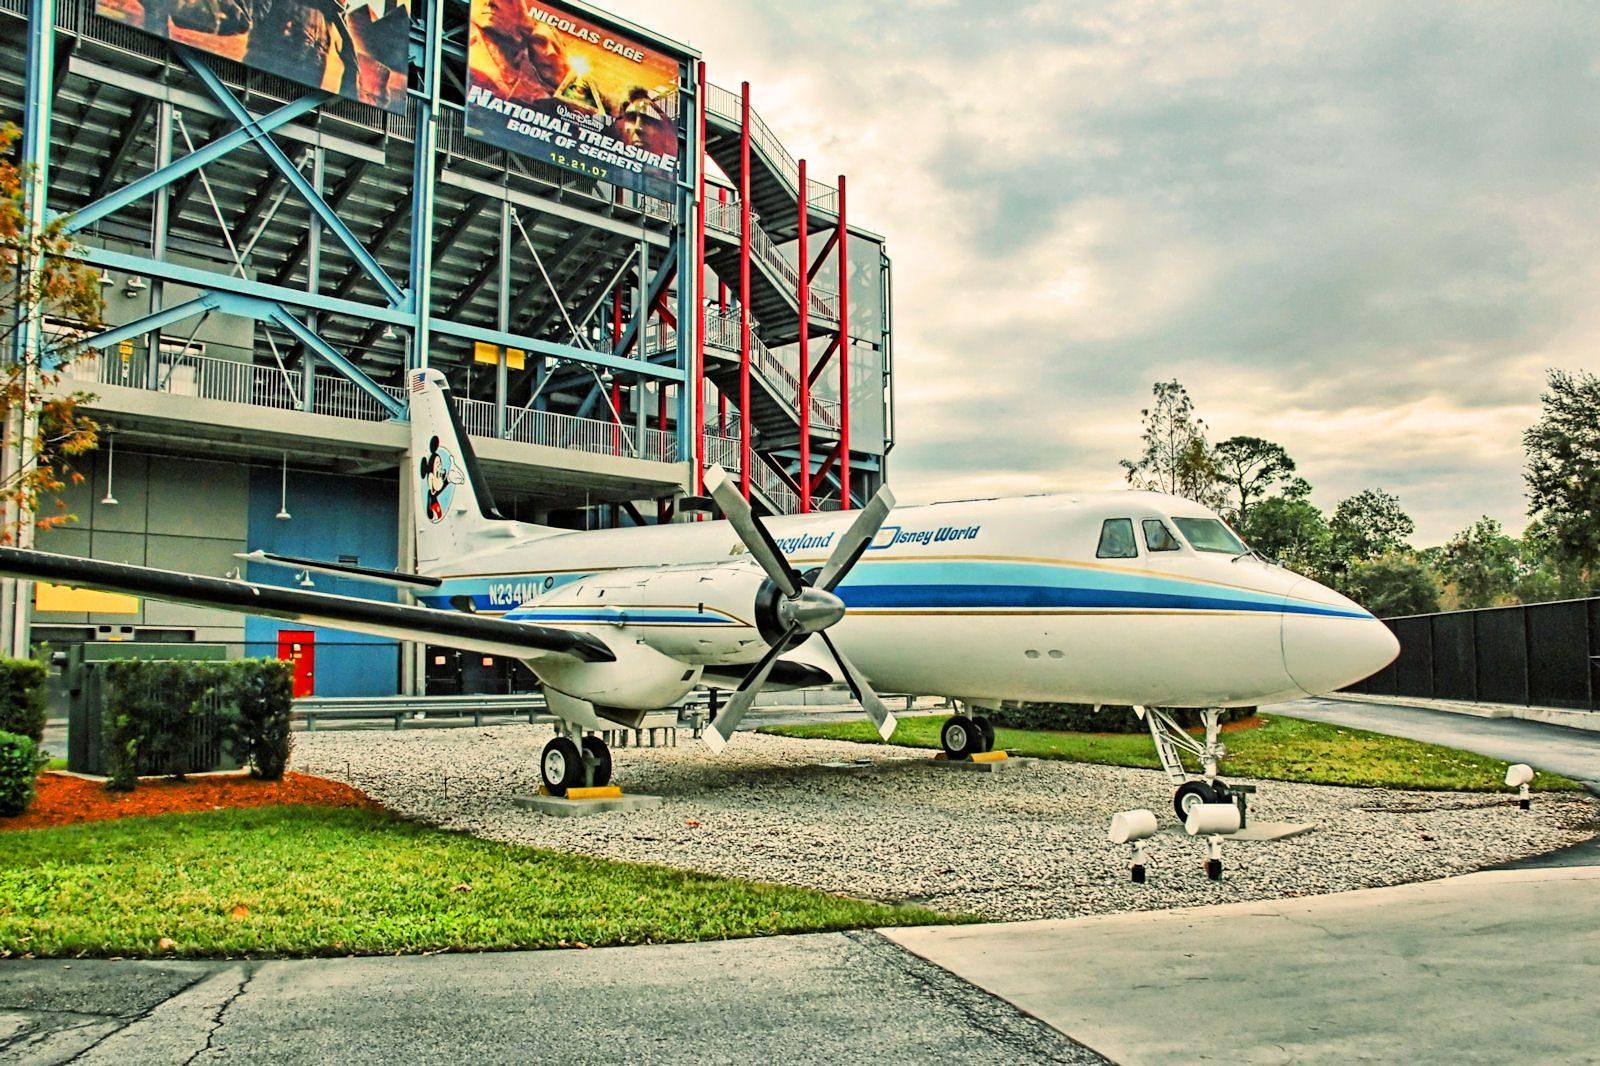 Walt Disney's Personal Airplane [Source: Joe Penniston on Flickr, Creative Commons License]